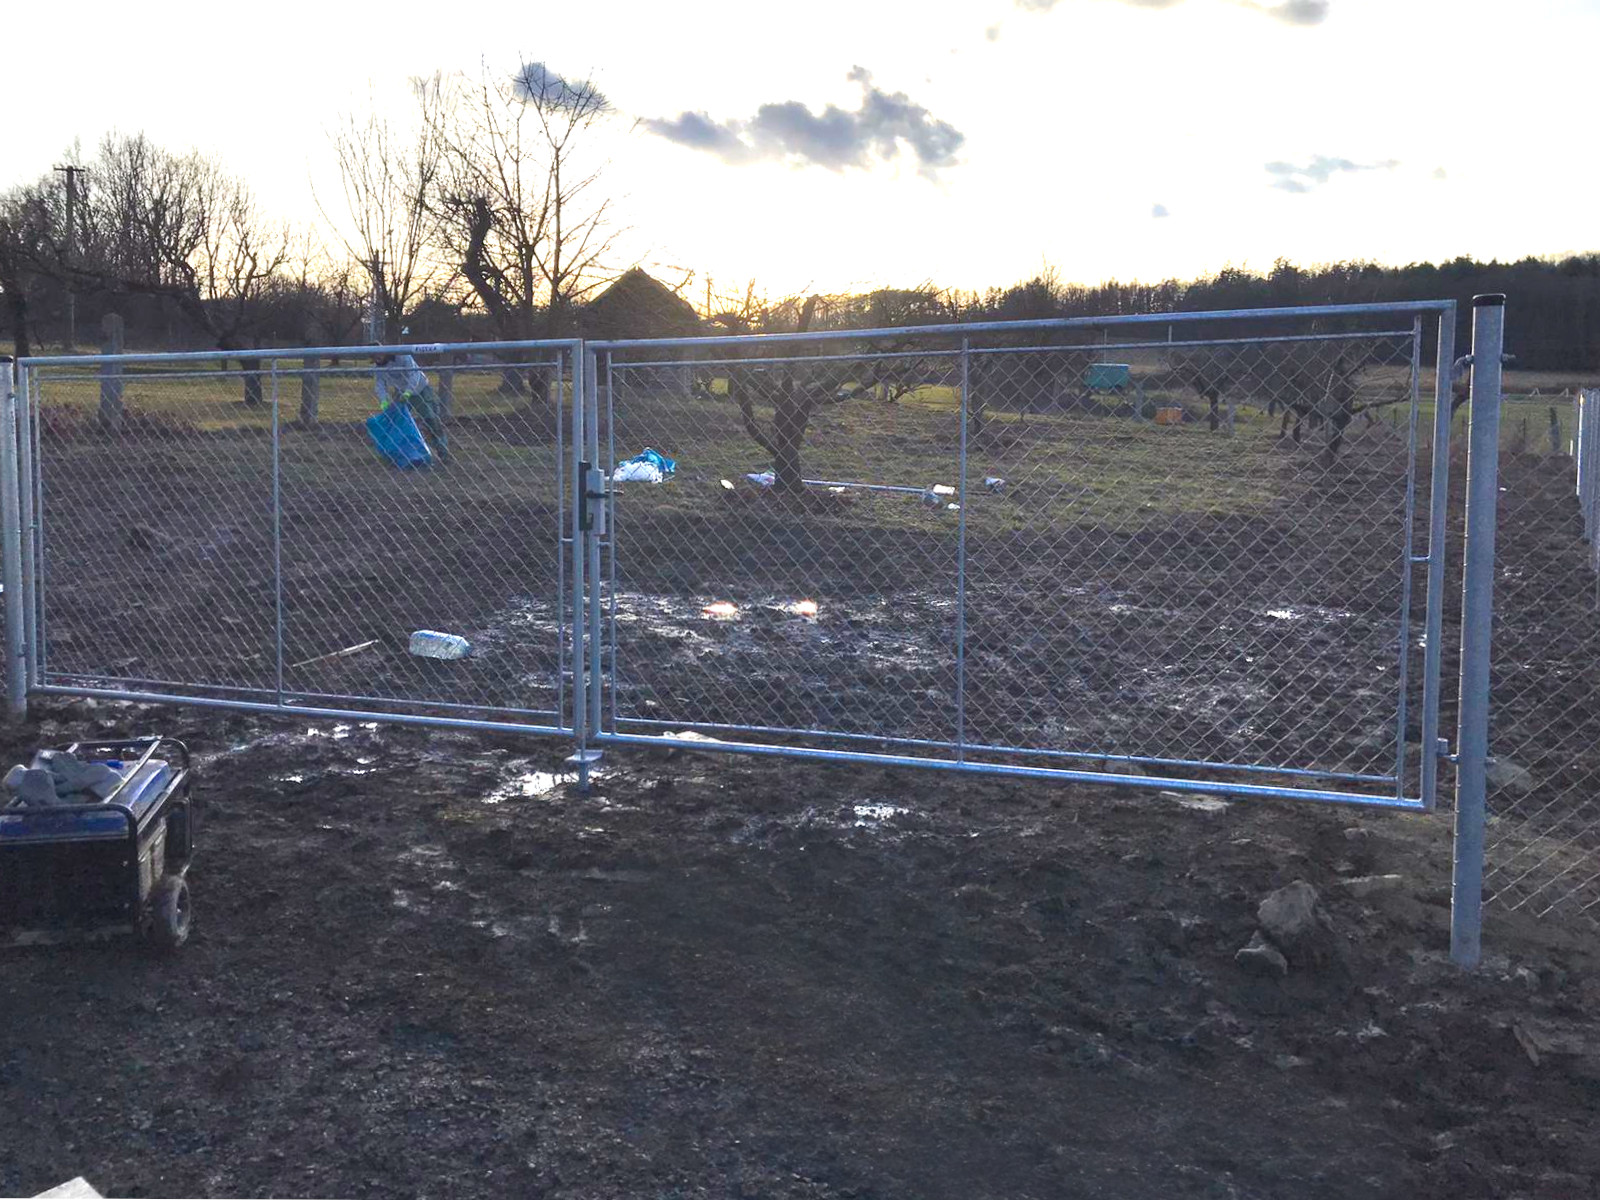 Brána zahradní dvoukřídlá pletivo, výška 125x360cm OKO pozink